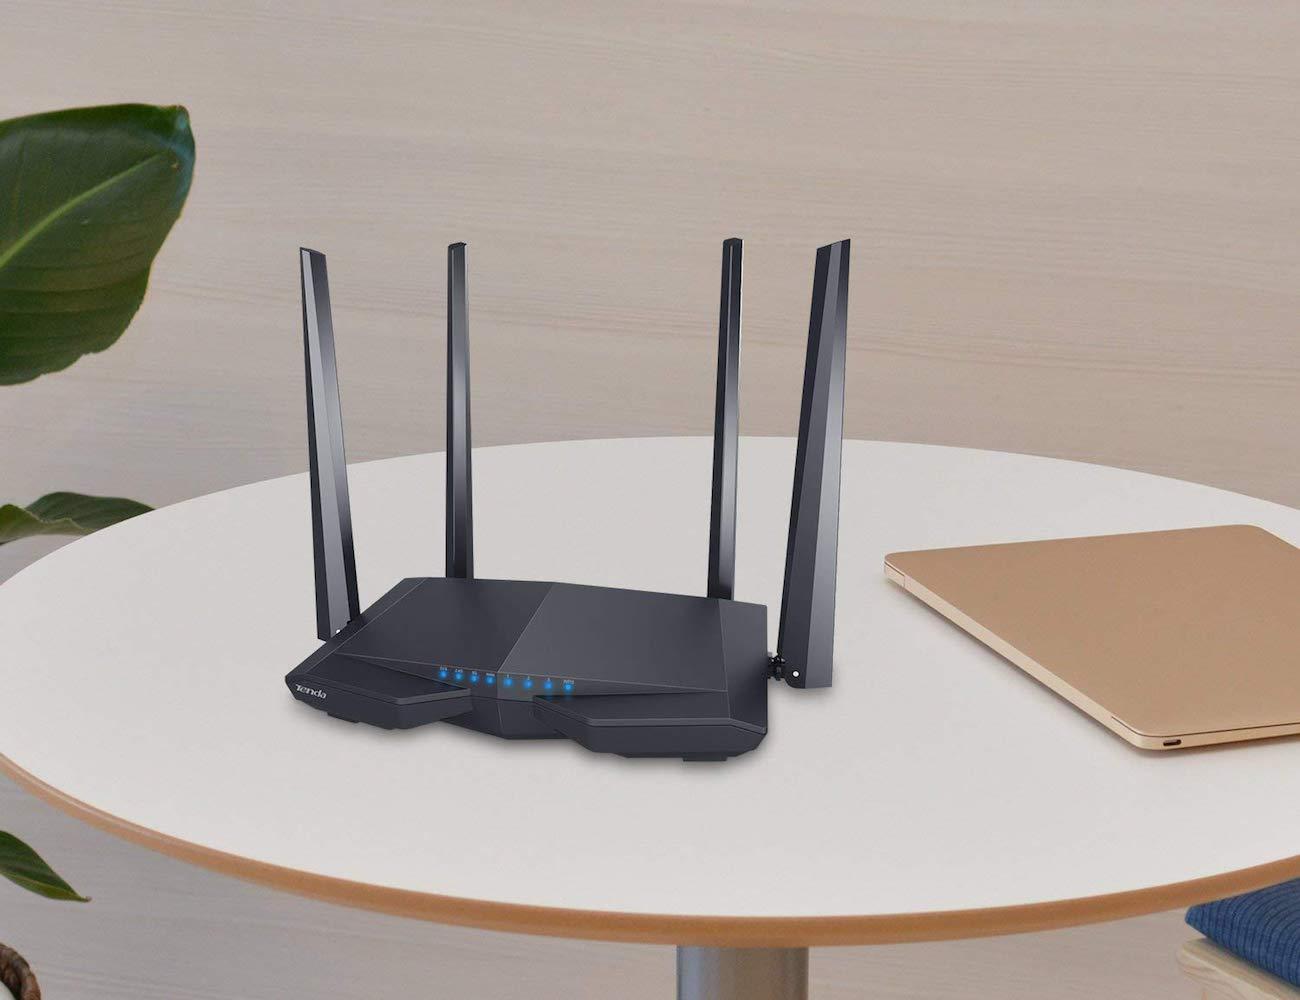 Tenda AC10U Smart Dual-Band Wi-Fi Router